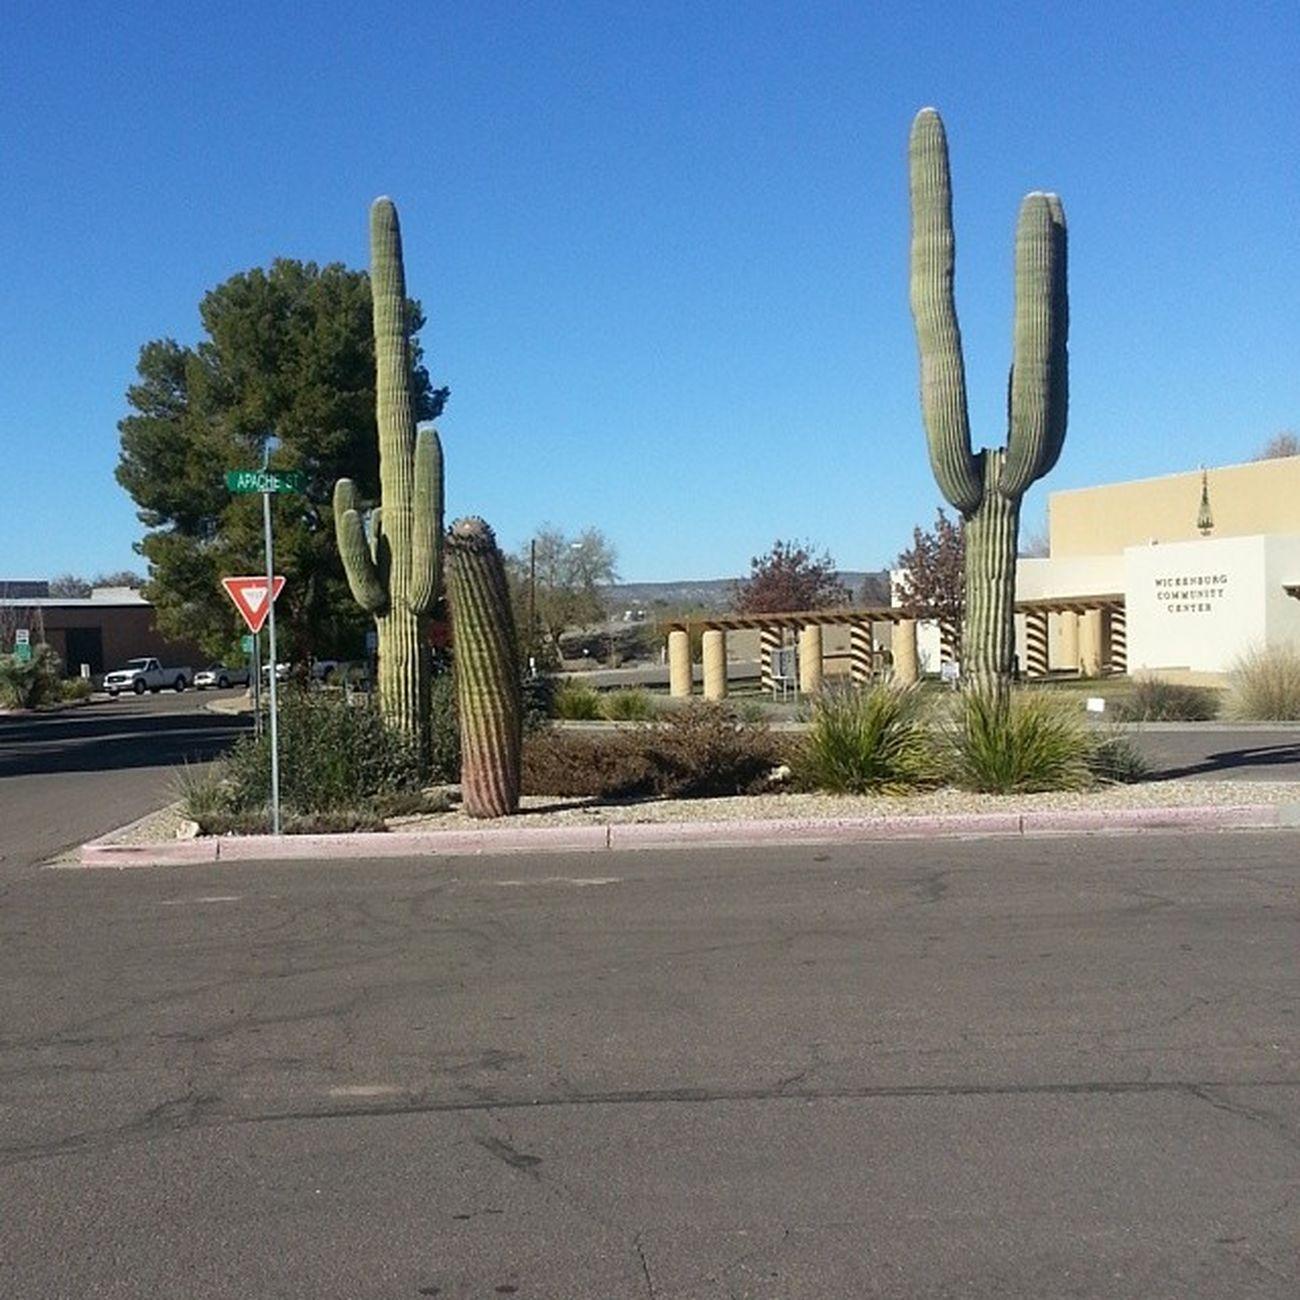 Cacti Wickenburg Arizona